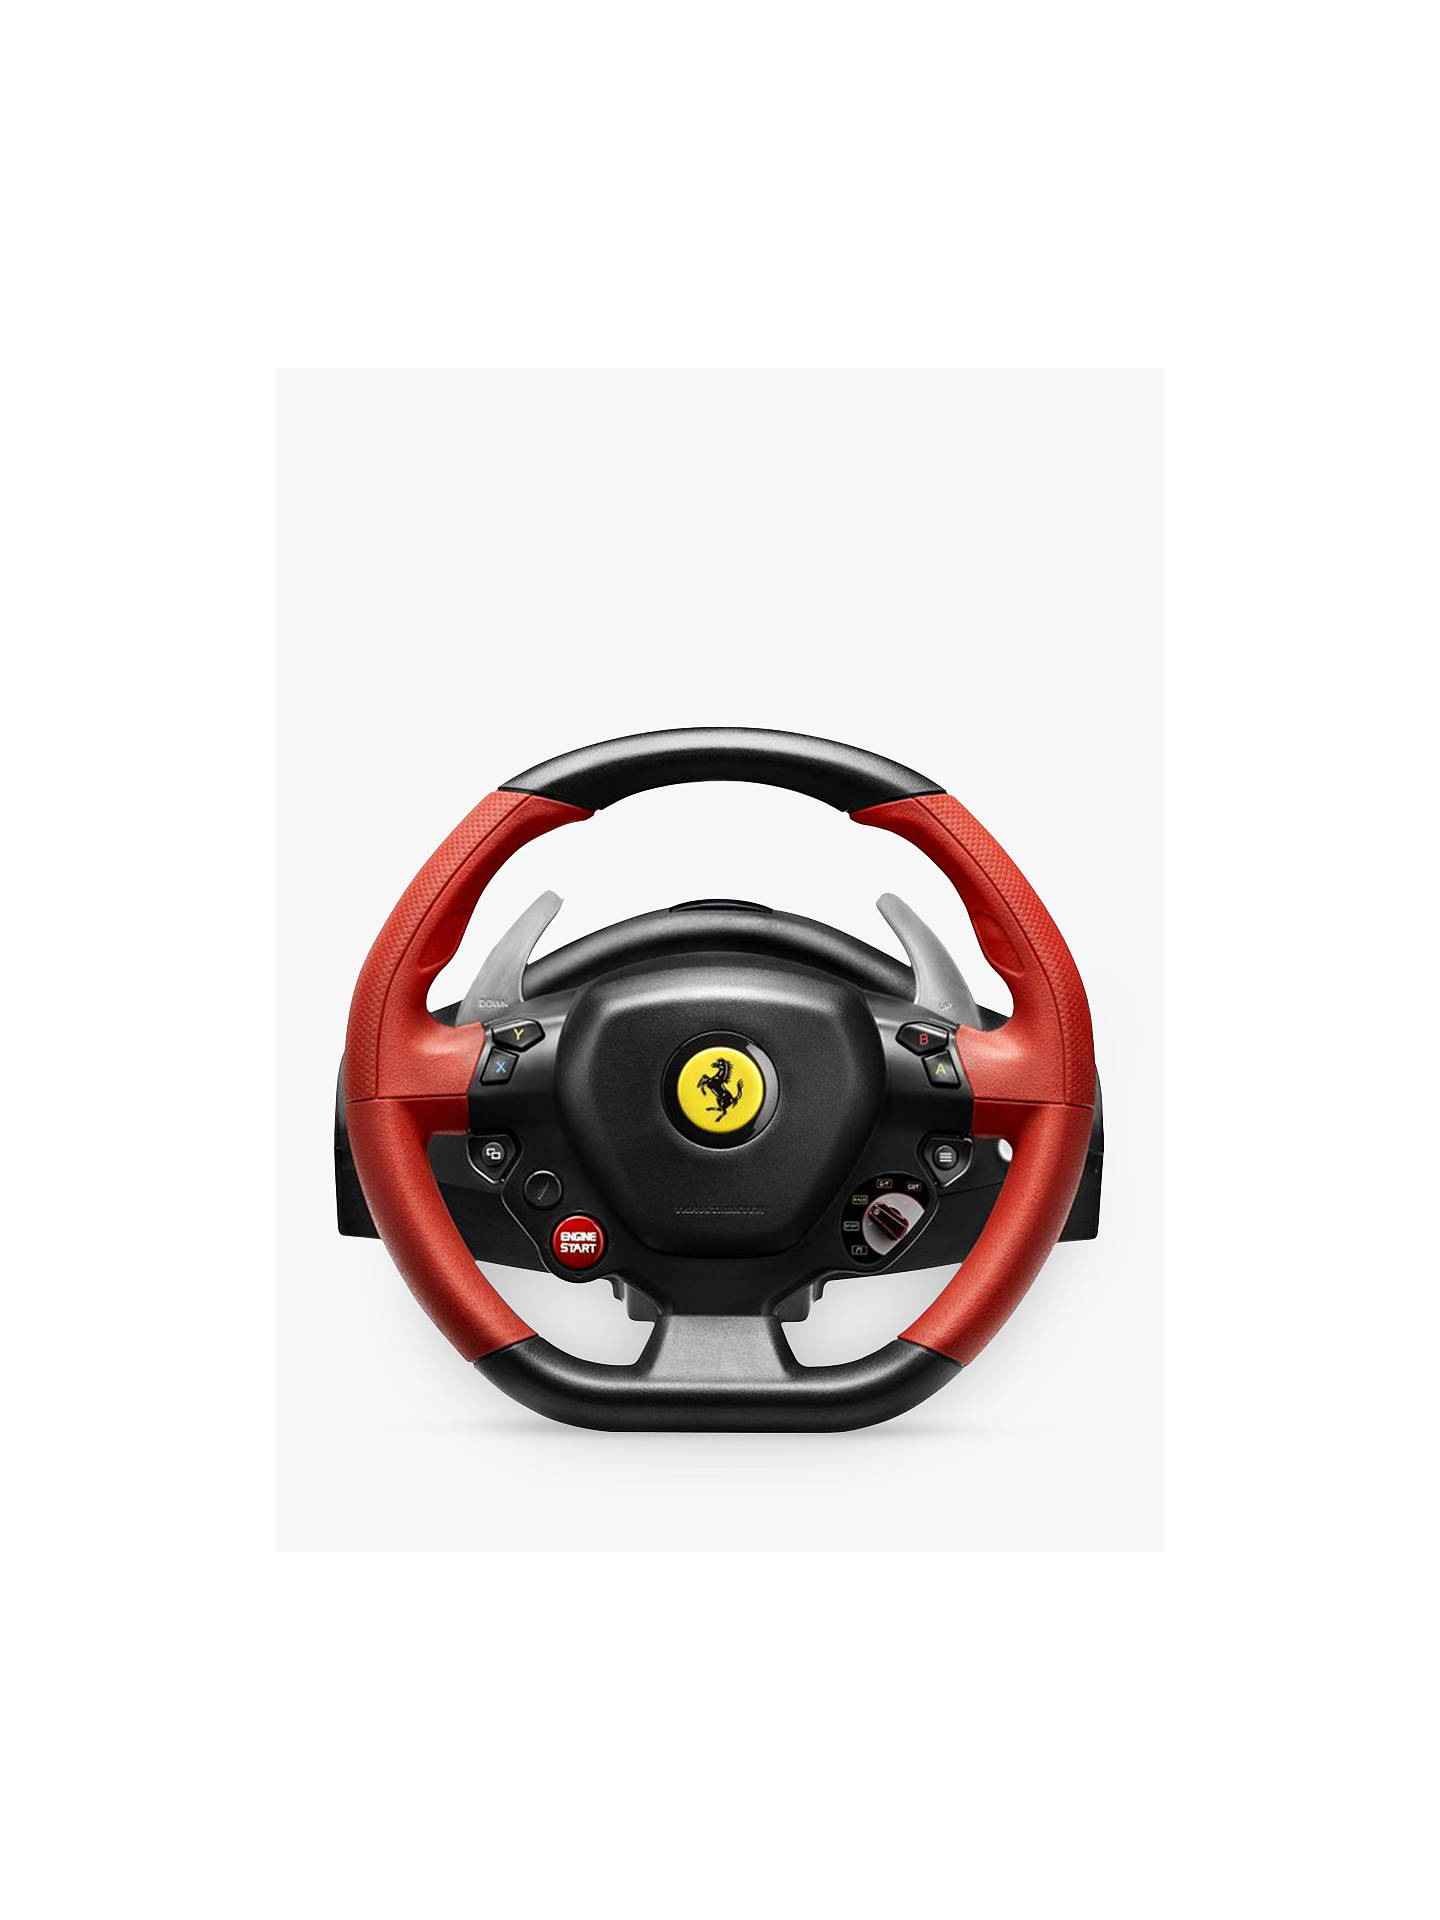 Thrustmaster Ferrari 458 Spider Racing Wheel for Xbox One at John Lewis & Partners